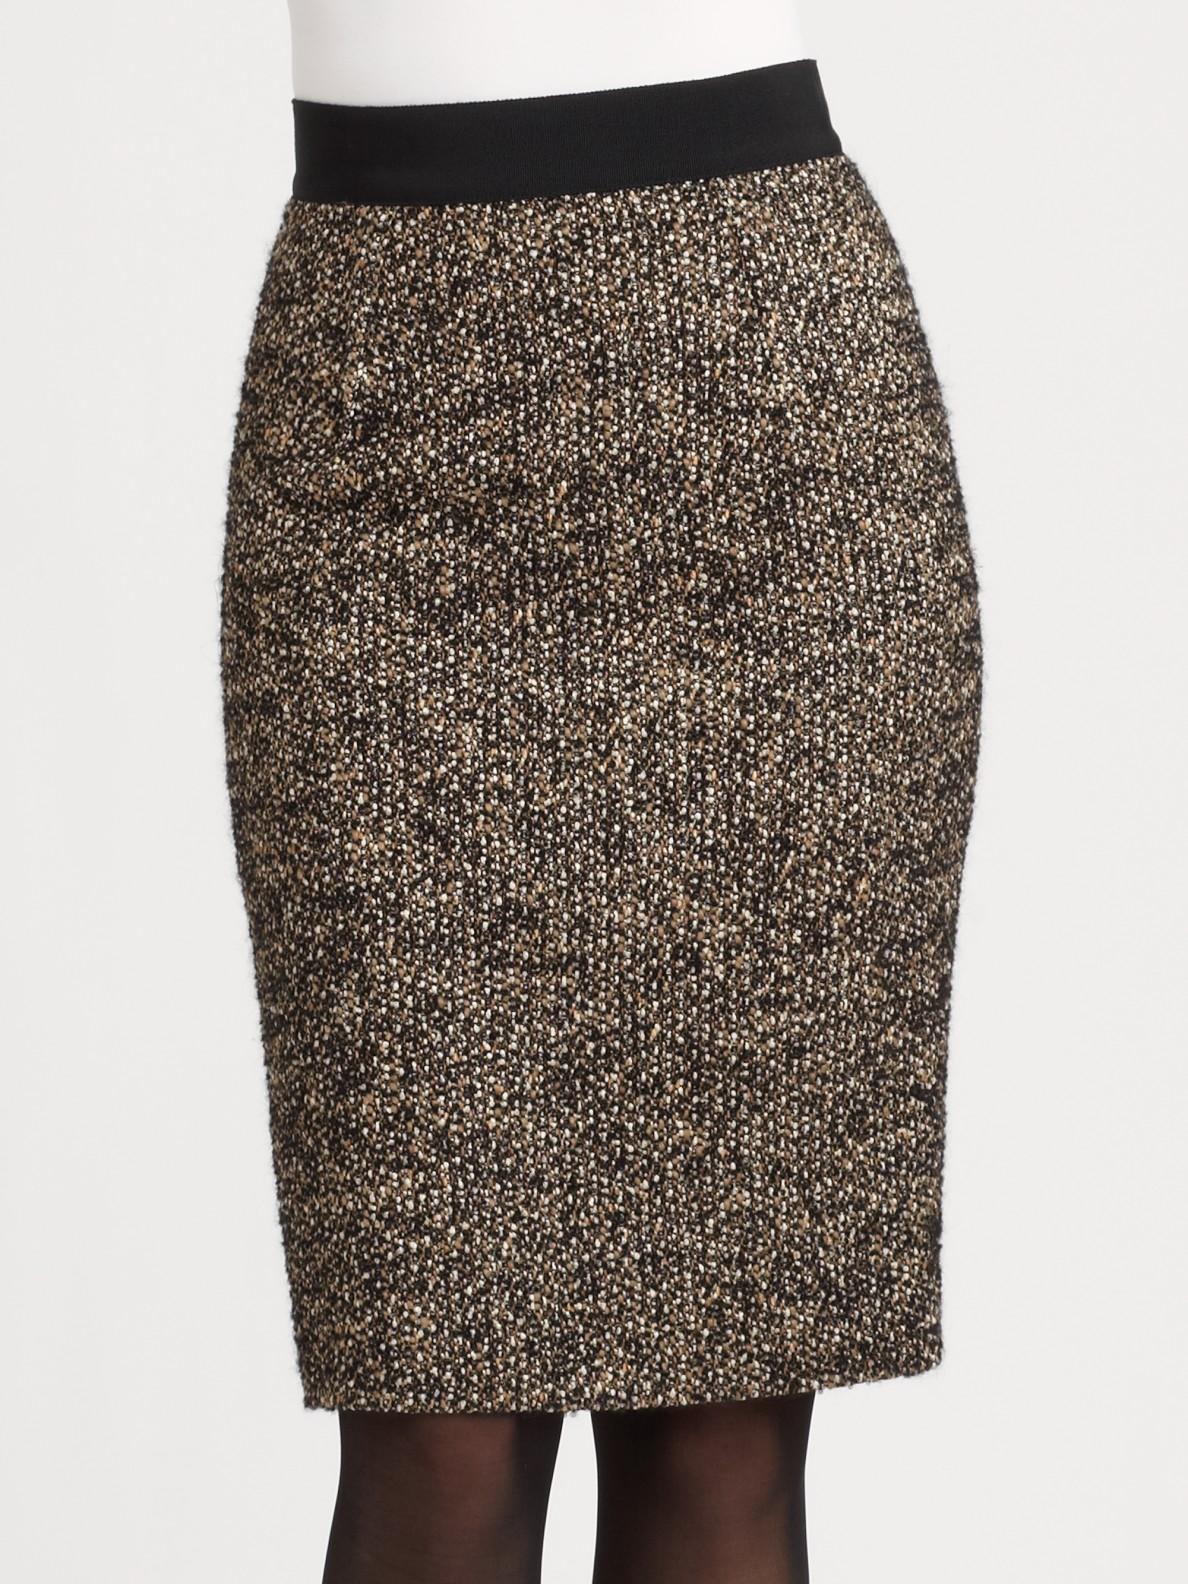 Giambattista valli Tweed Pencil Skirt in Brown | Lyst